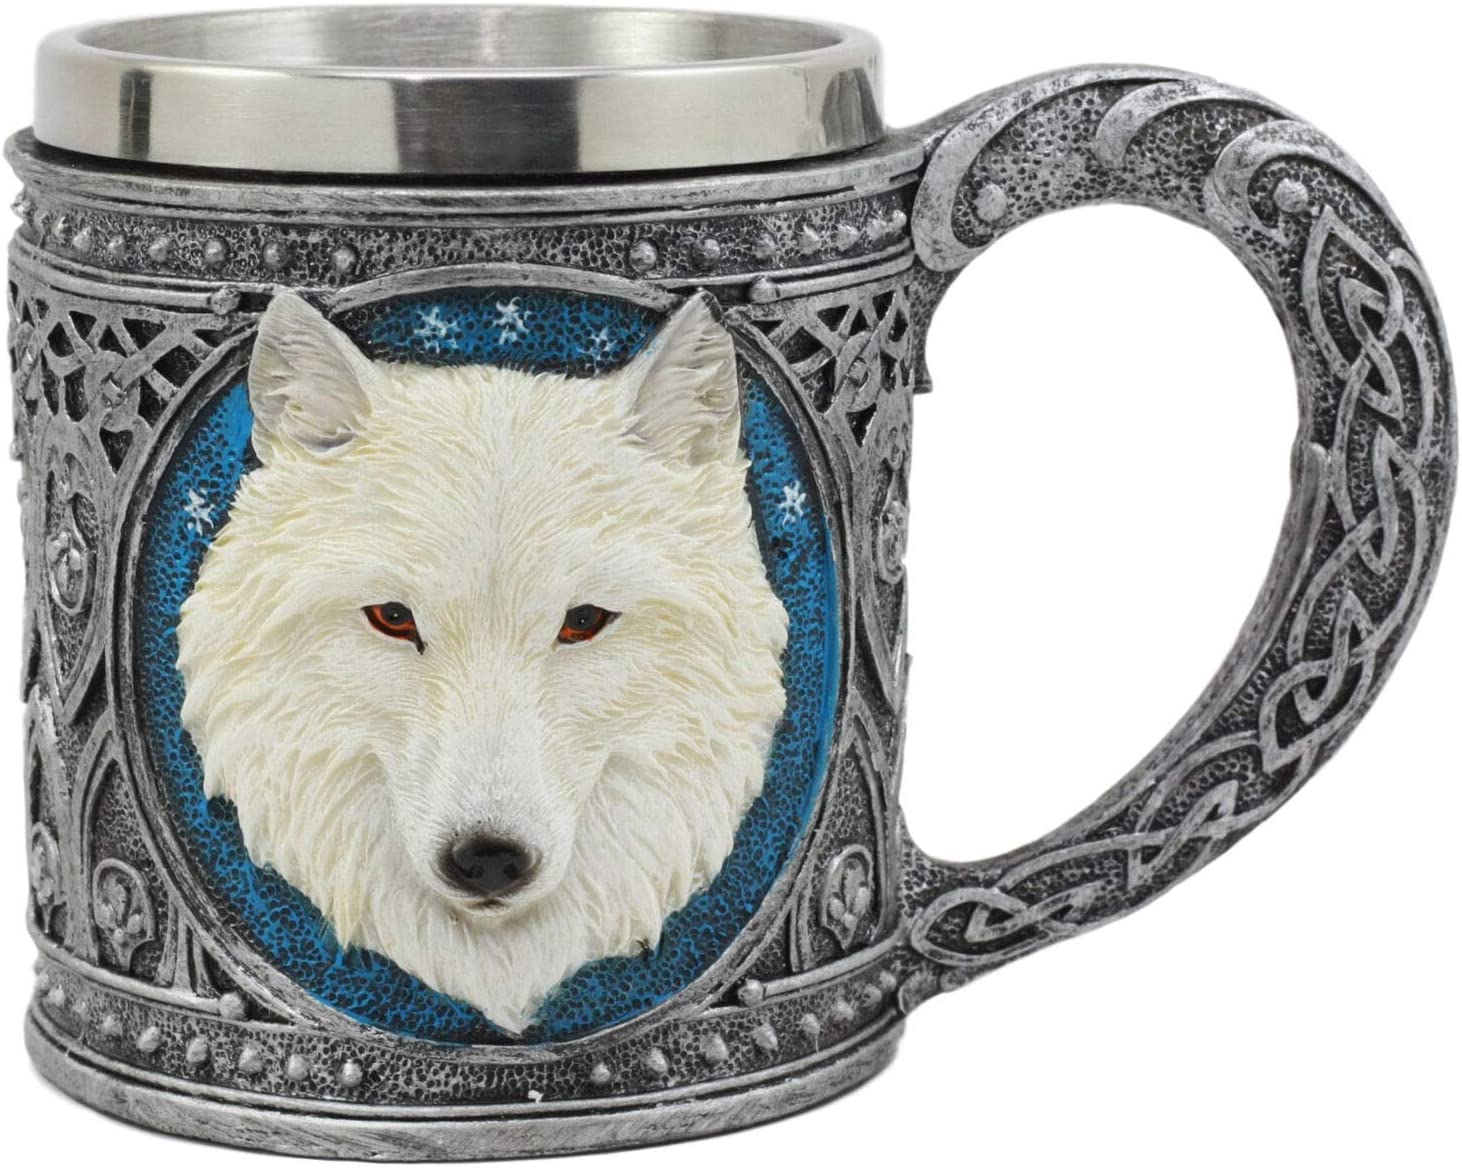 Alpha Gray Wolf Tribal Celtic Resin 16oz Mug With Stainless Steel Rim Figurine